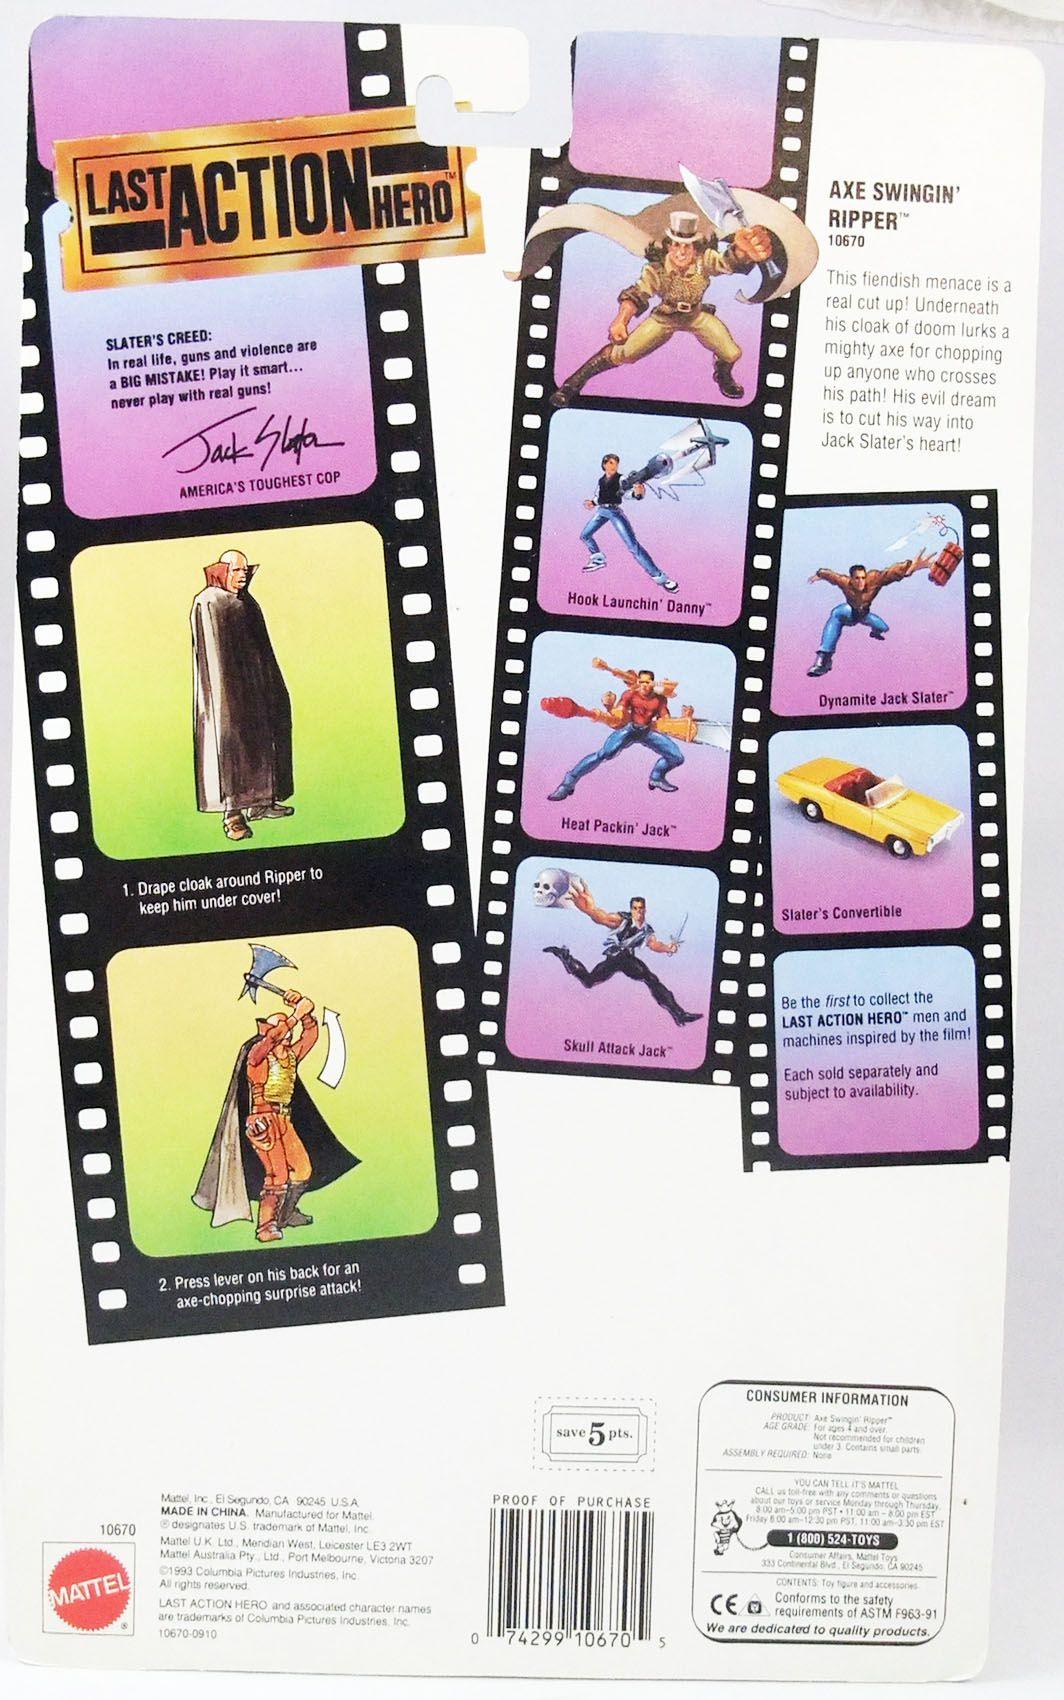 Last Action Hero - Mattel - Axe Swingin\' Ripper